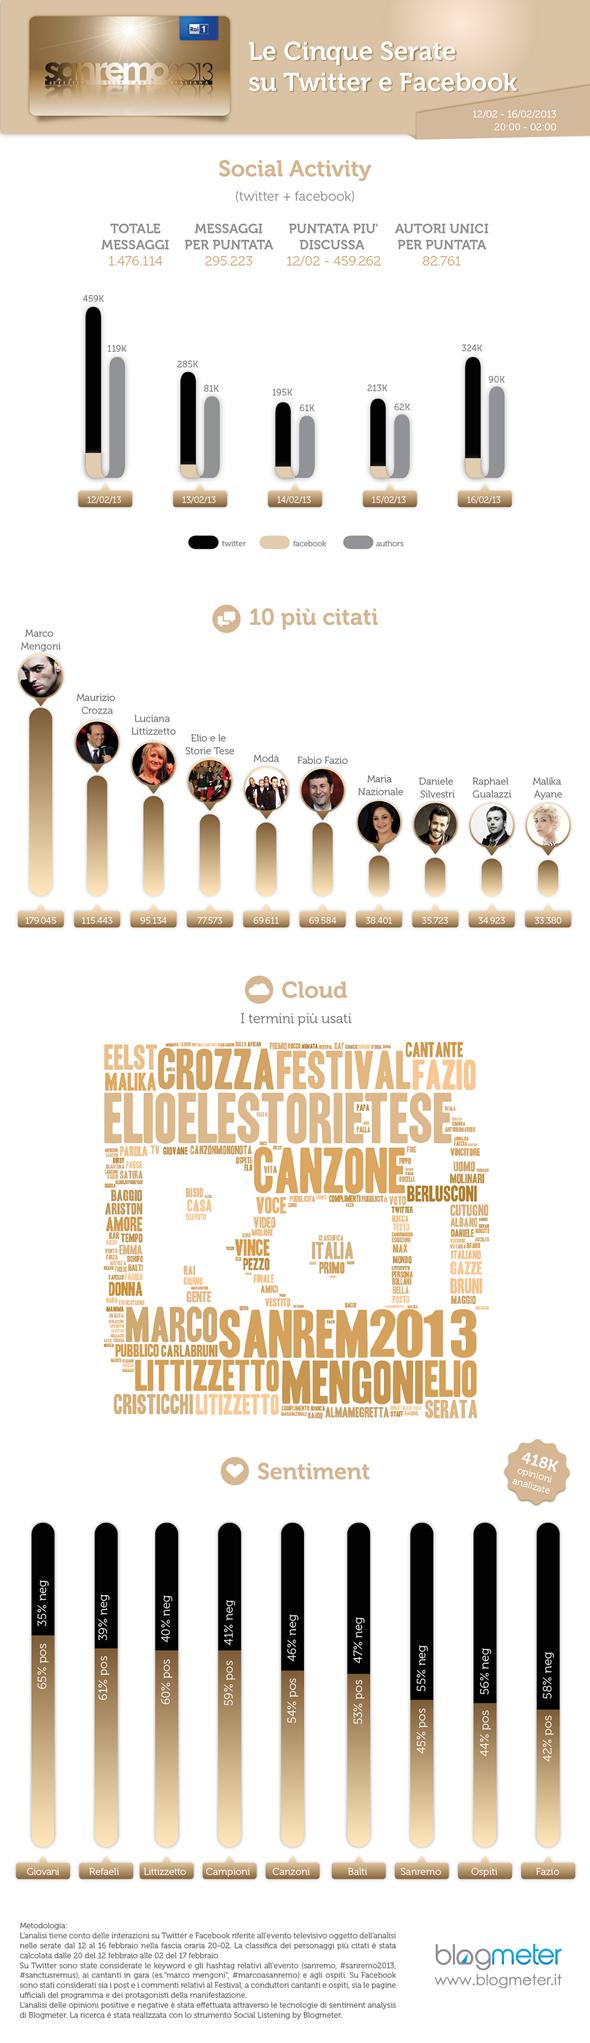 sanremo2013_infografica